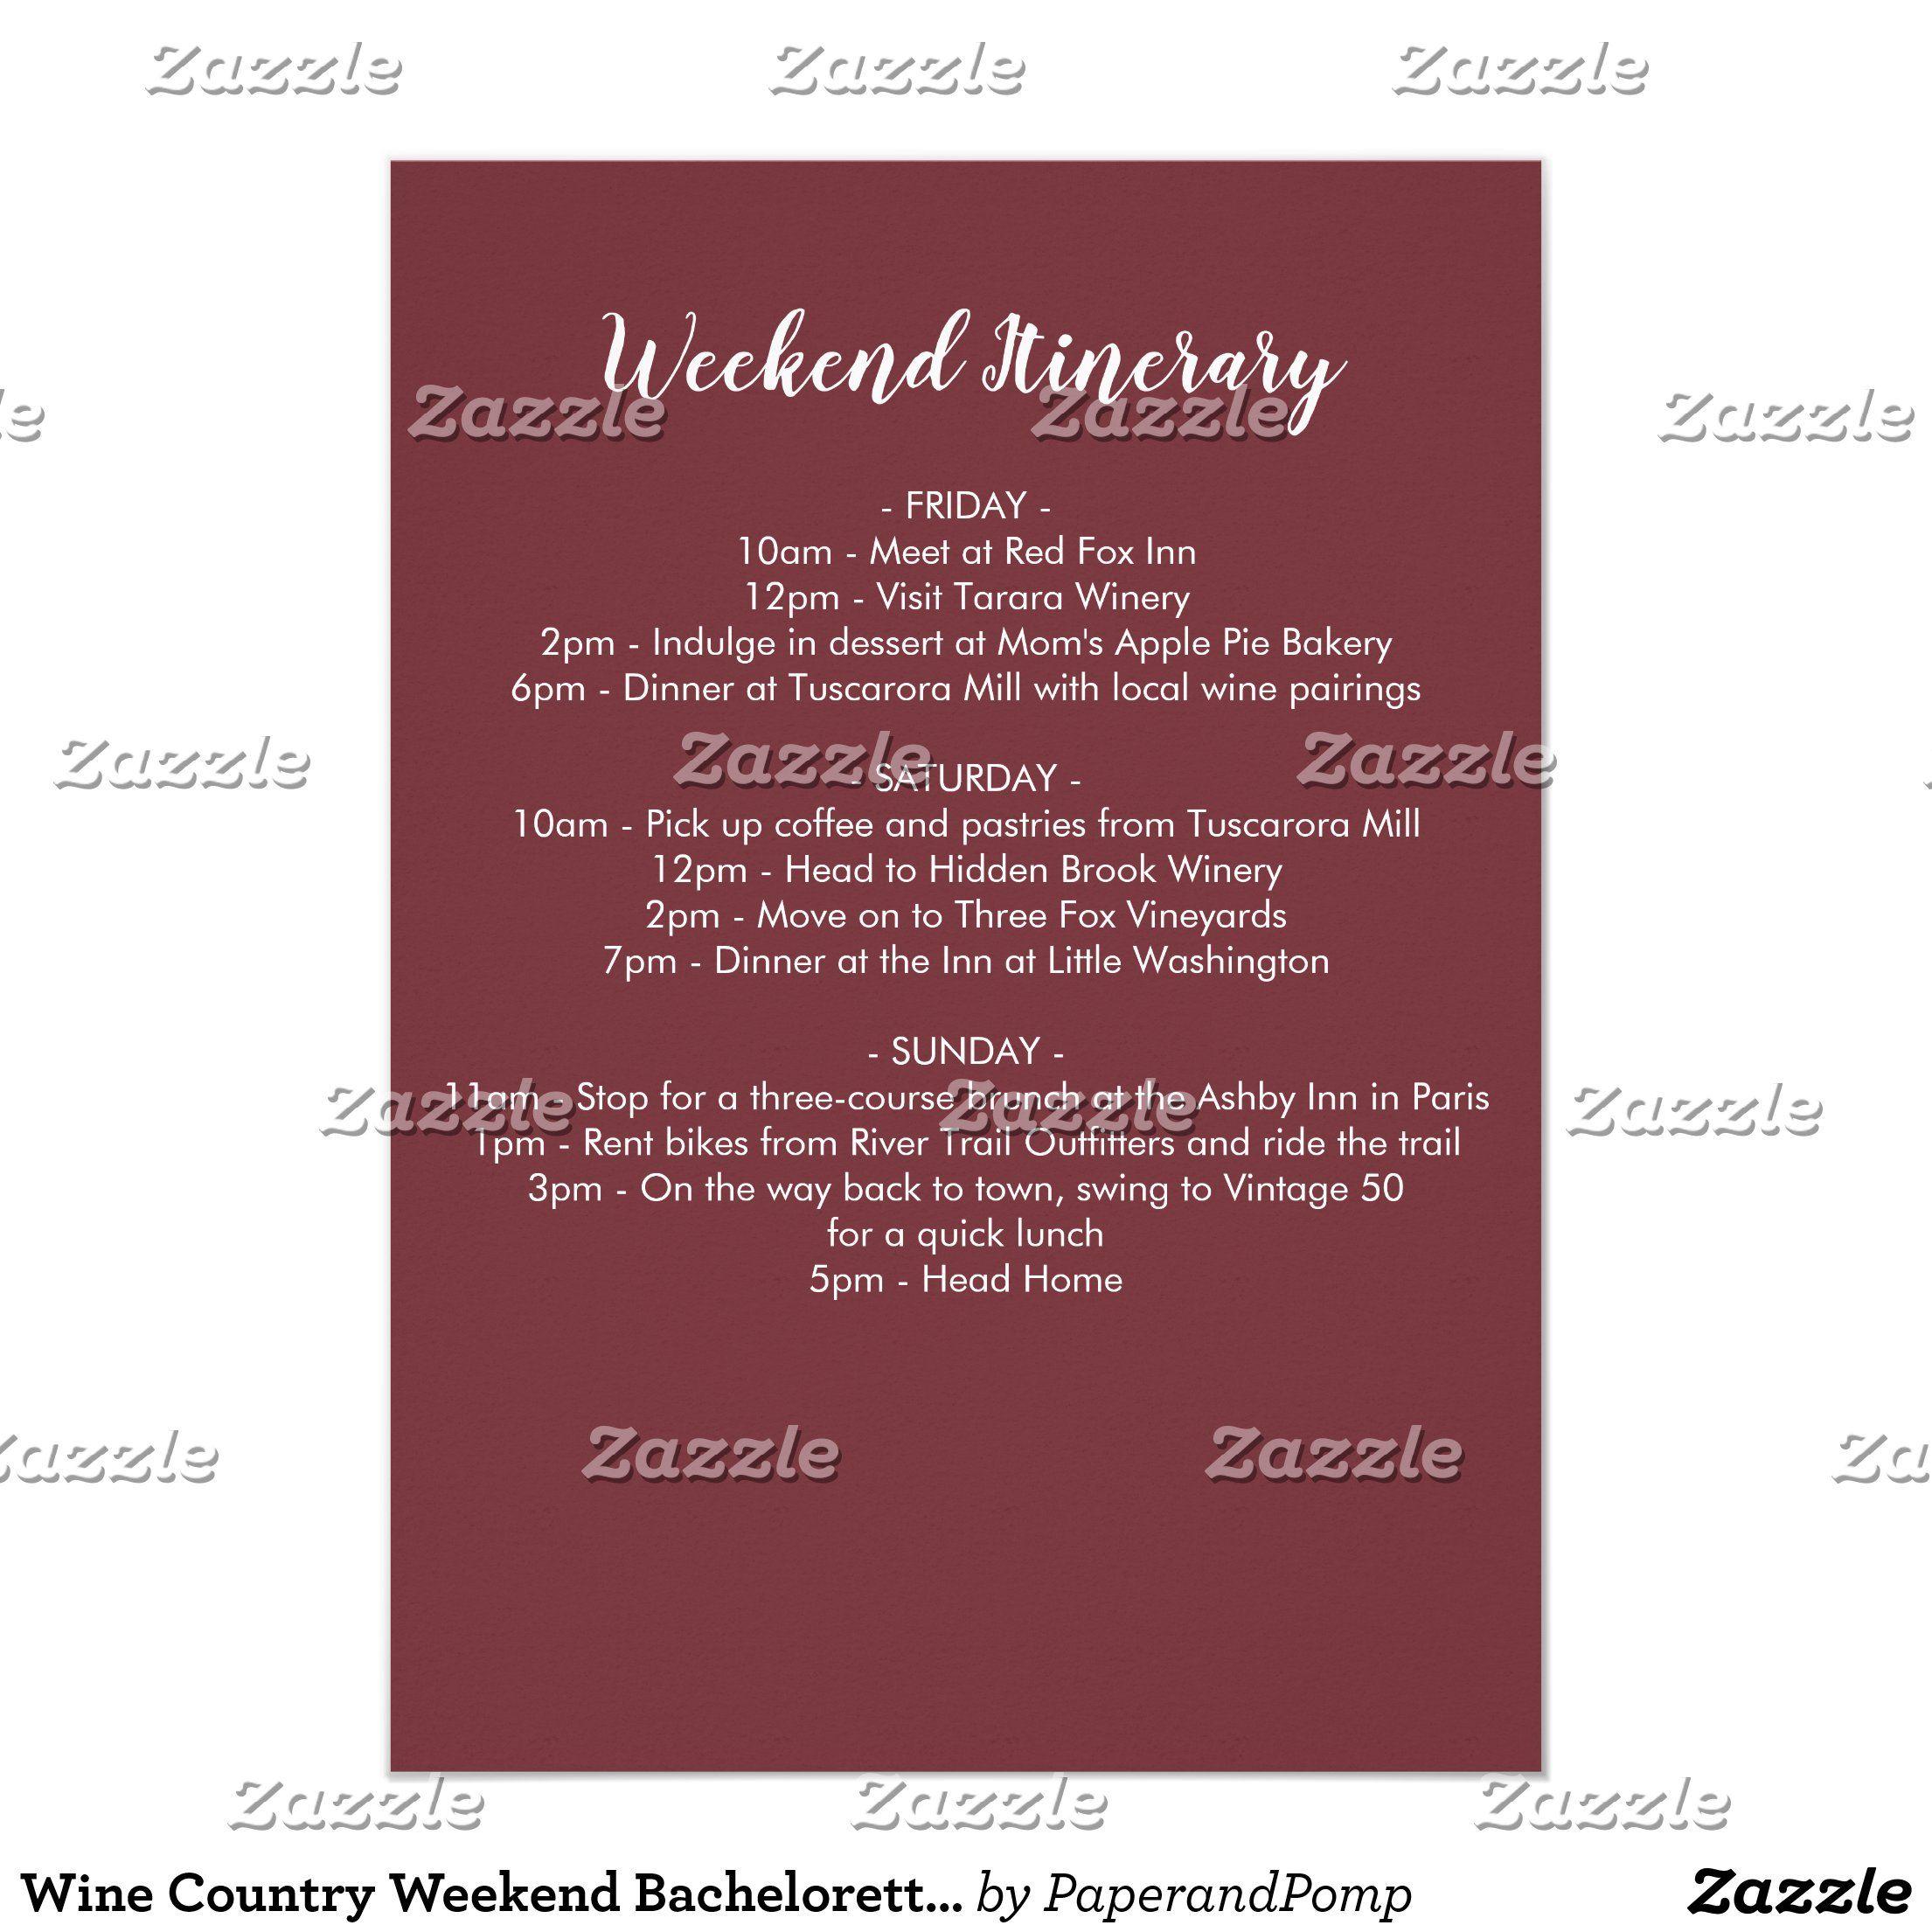 Wine Country Weekend Bachelorette Invitation Zazzle Com In 2020 Bachelorette Invitations Wine Tasting Bachelorette Party Wine Bachelorette Party